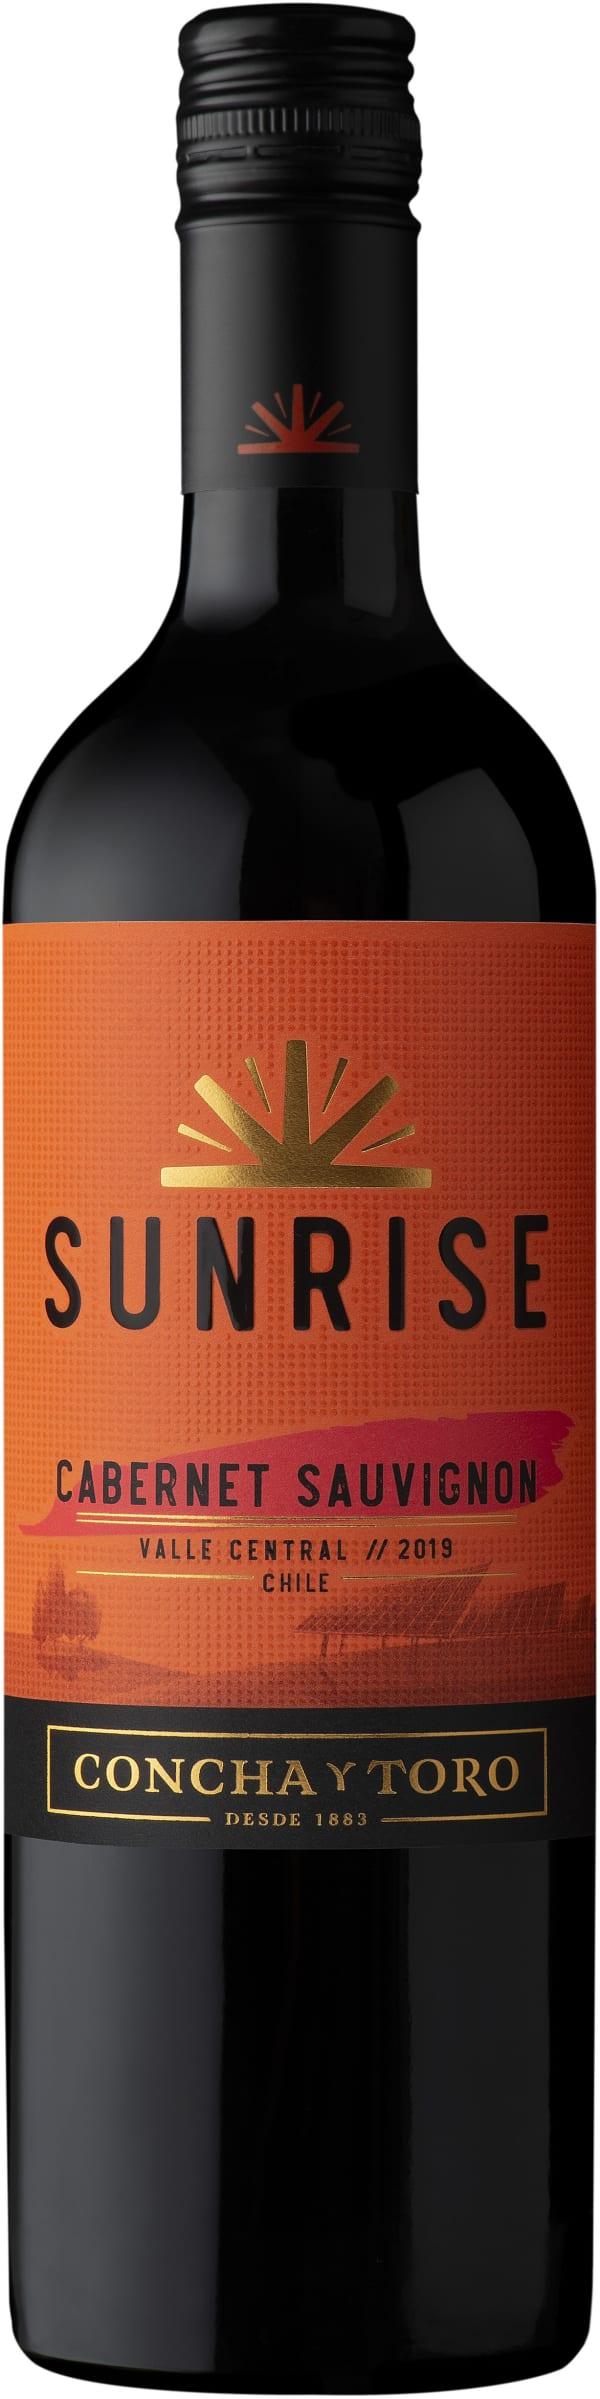 Sunrise Cabernet Sauvignon 2016